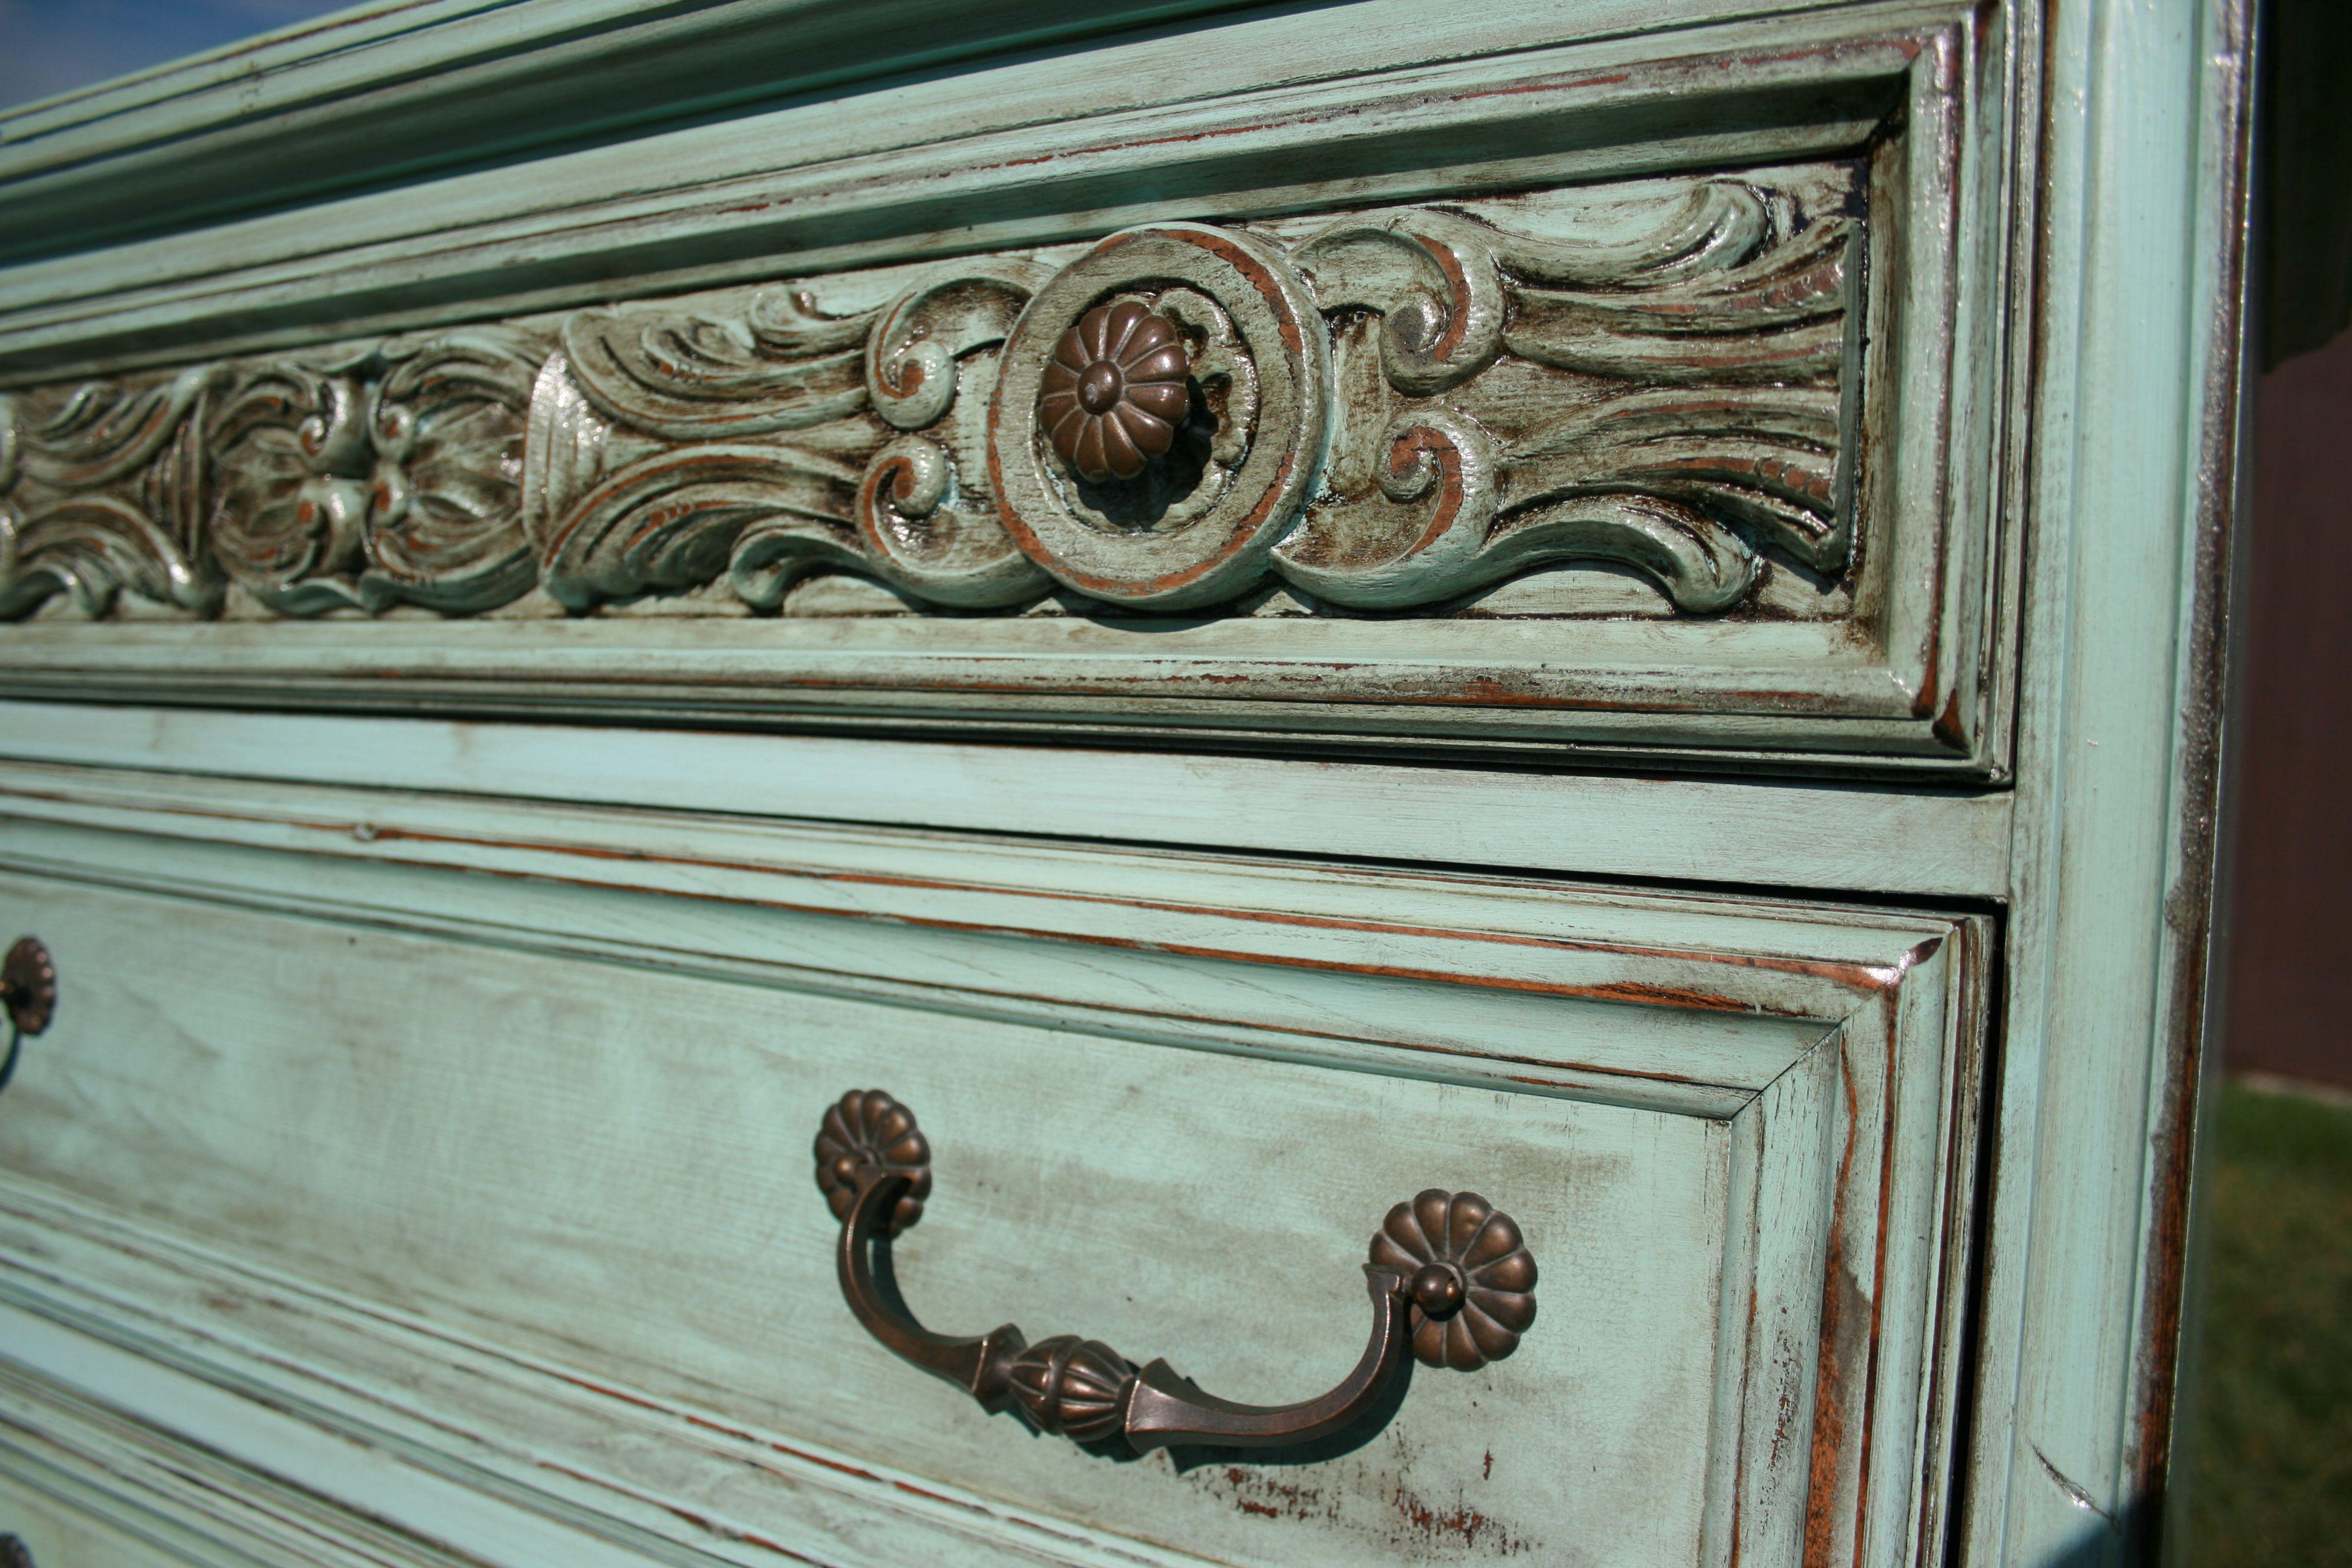 5 Drawer Dresser For Sale At Consign Design Furniture Colorado Springs Home Design Decor Distressed Furniture Painting Furniture Design